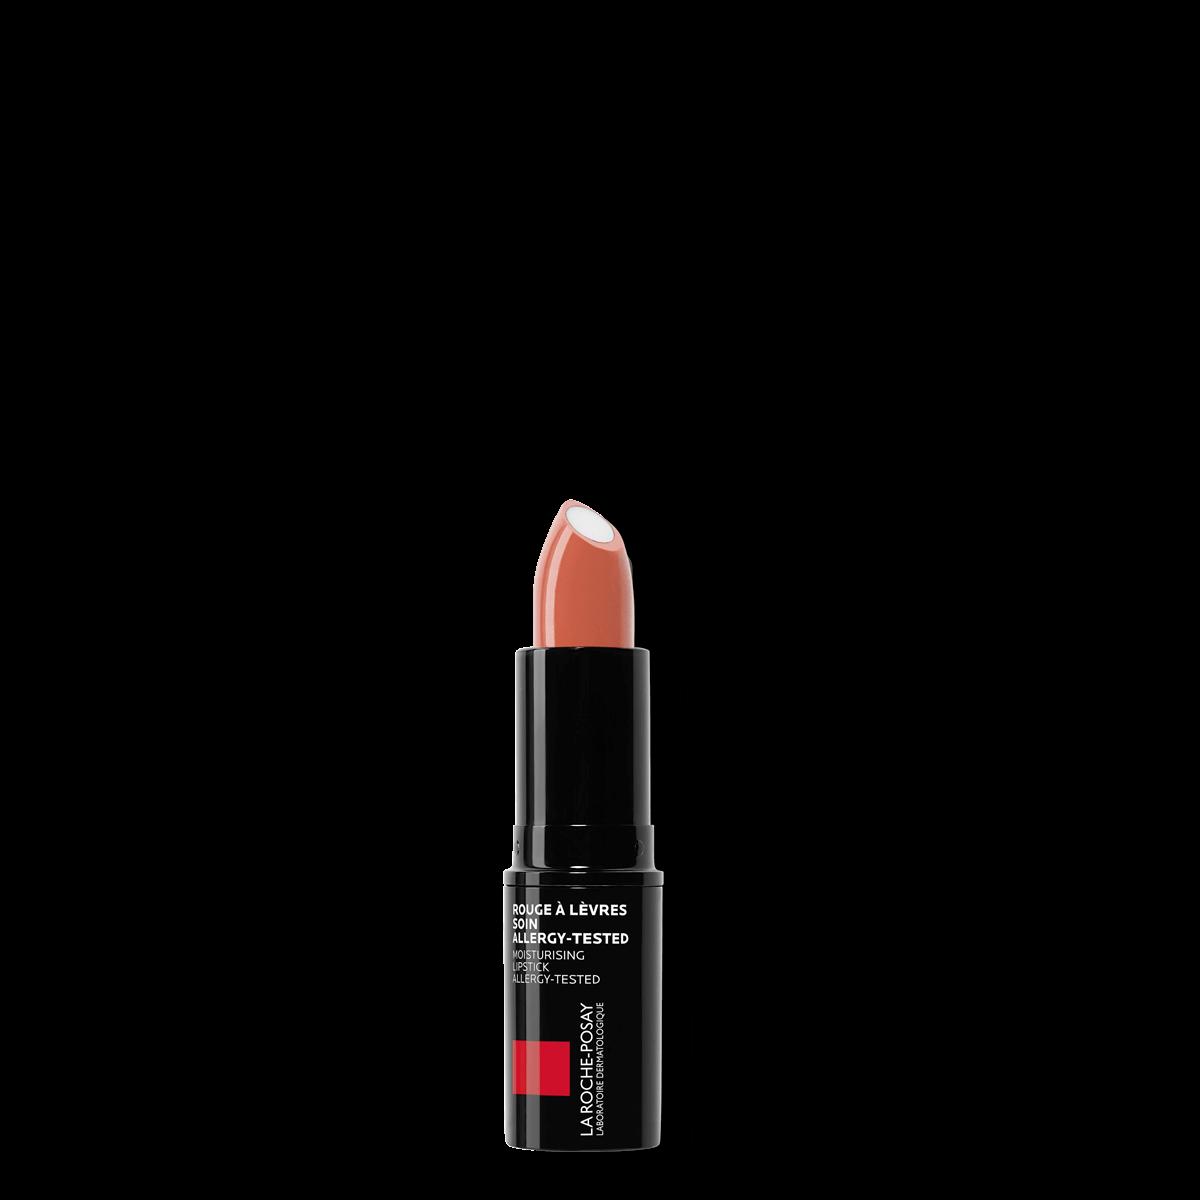 La Roche Posay Sensitiv Toleriane Makeup NOVALIP 170BrunSepia 300926